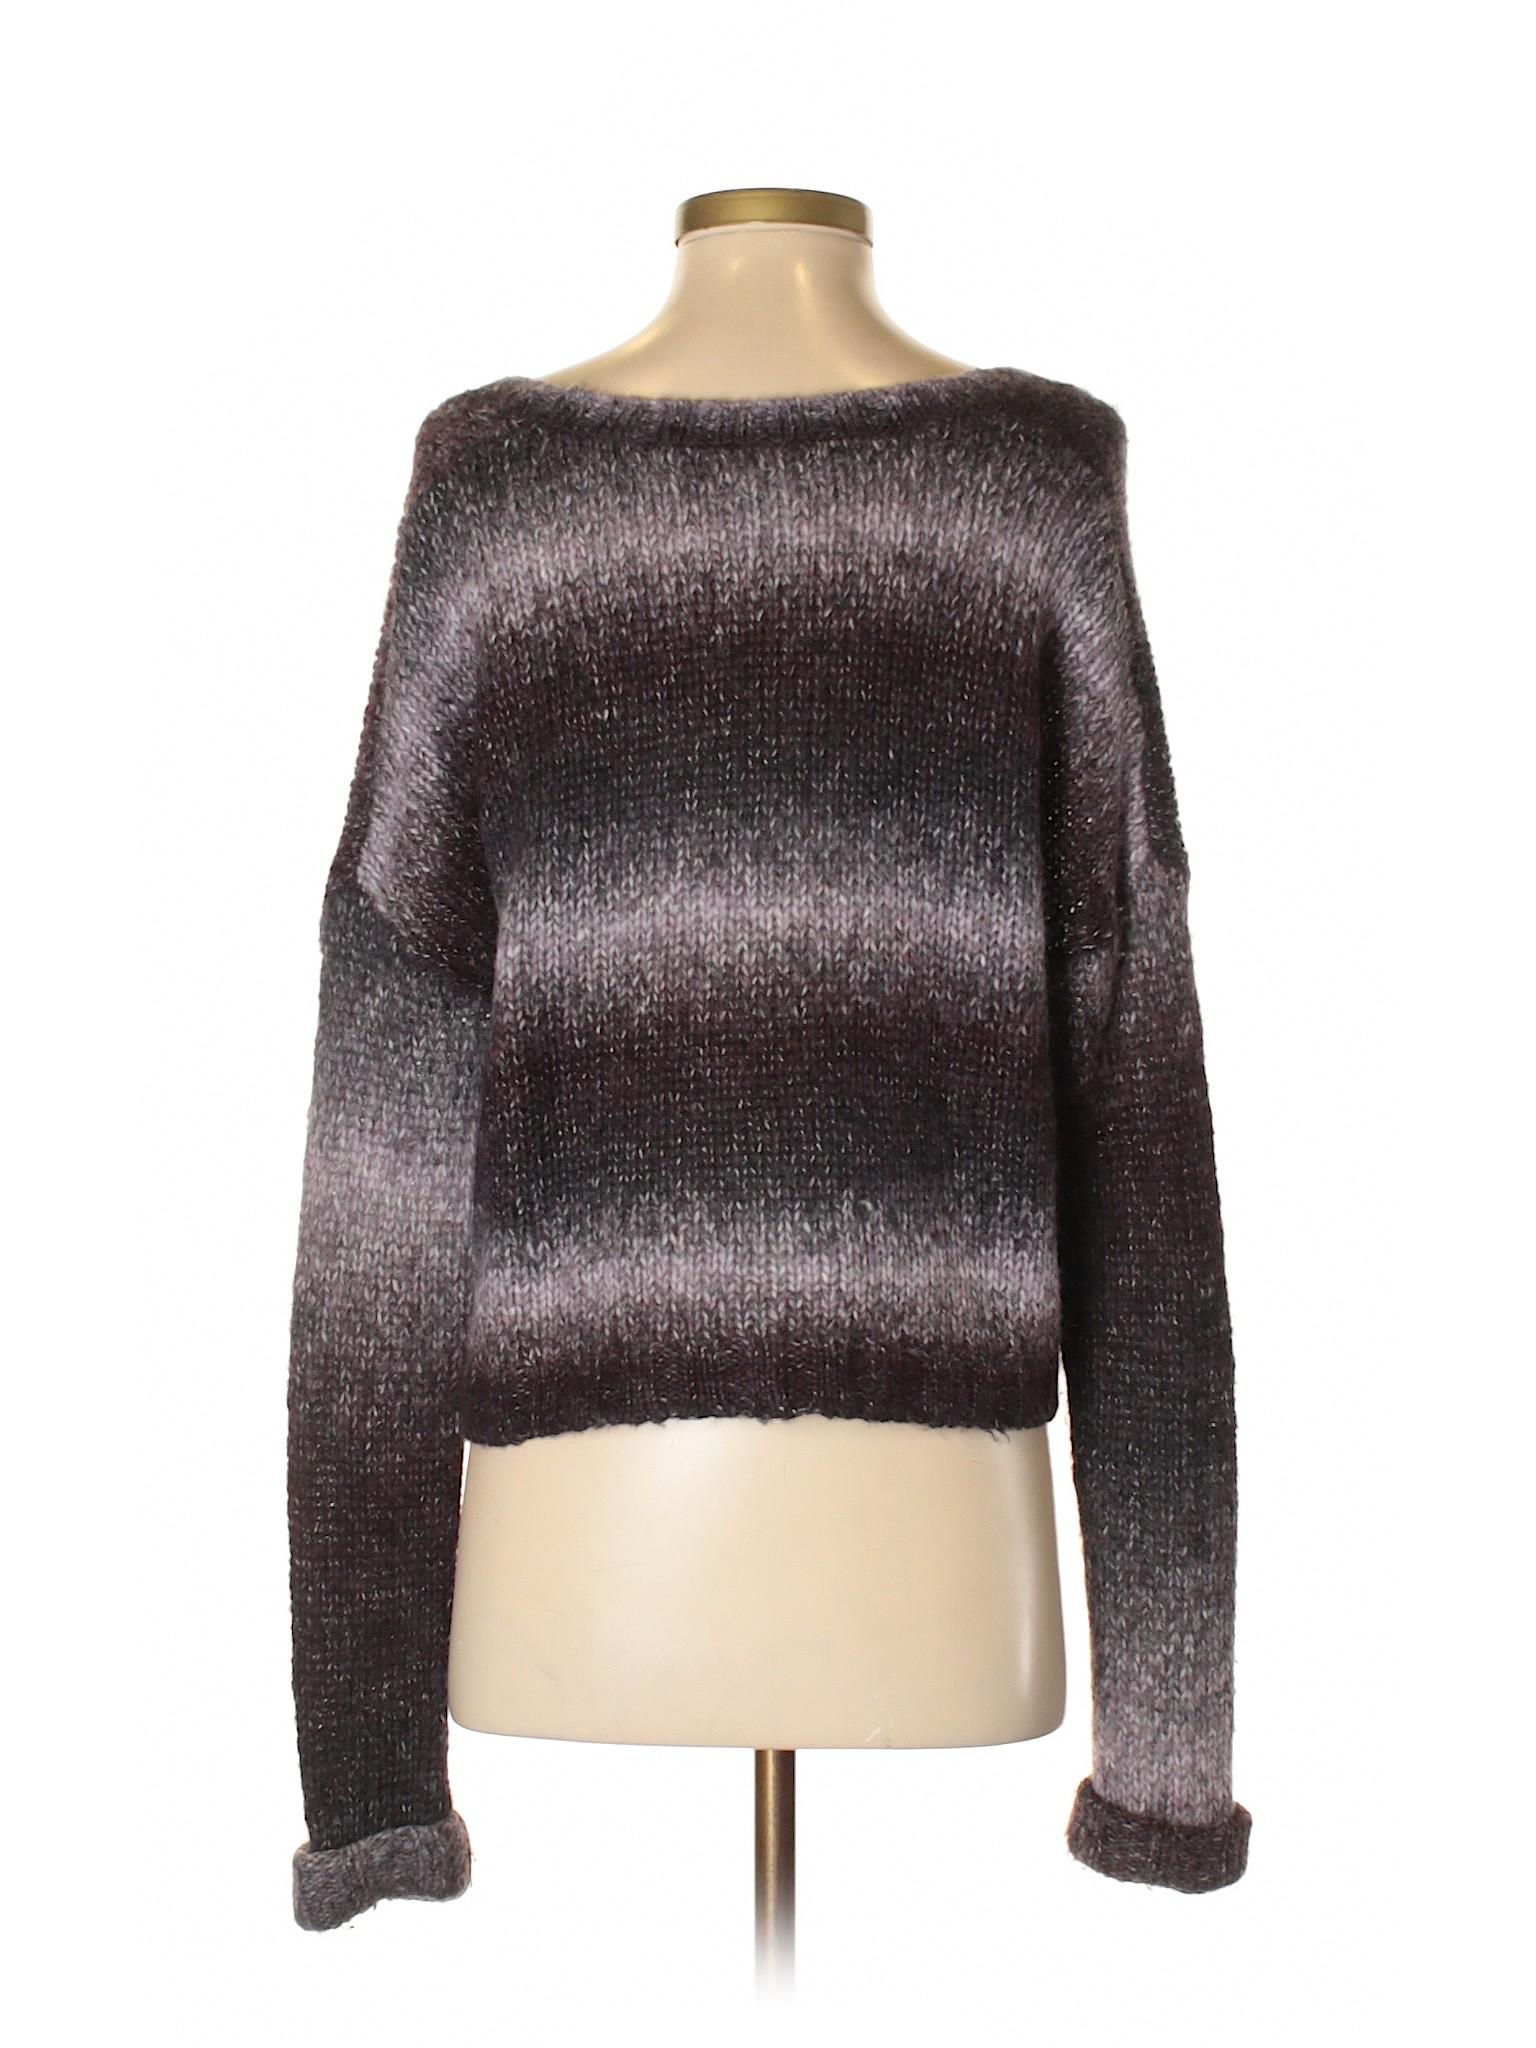 Boutique Ecote Boutique winter winter Ecote Boutique Sweater Sweater Pullover Pullover w6ax5q10gH